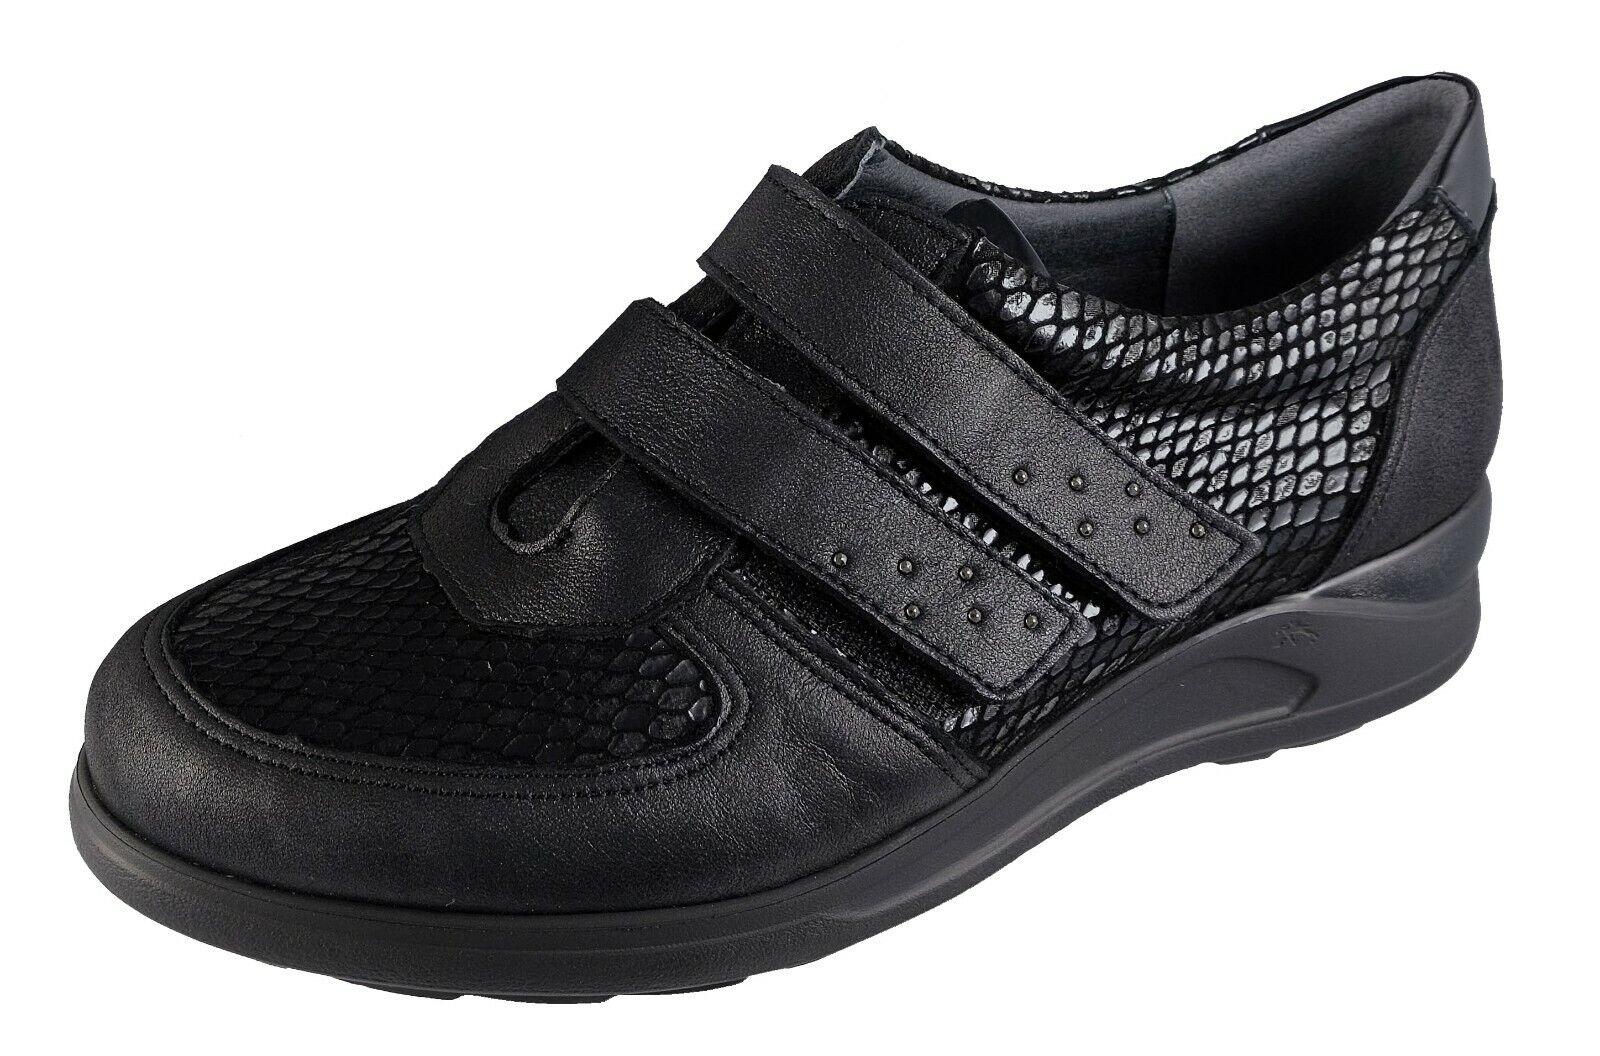 FlUCHOS Cloe Chaussures Femme Semelles Amovibles Noir F0711